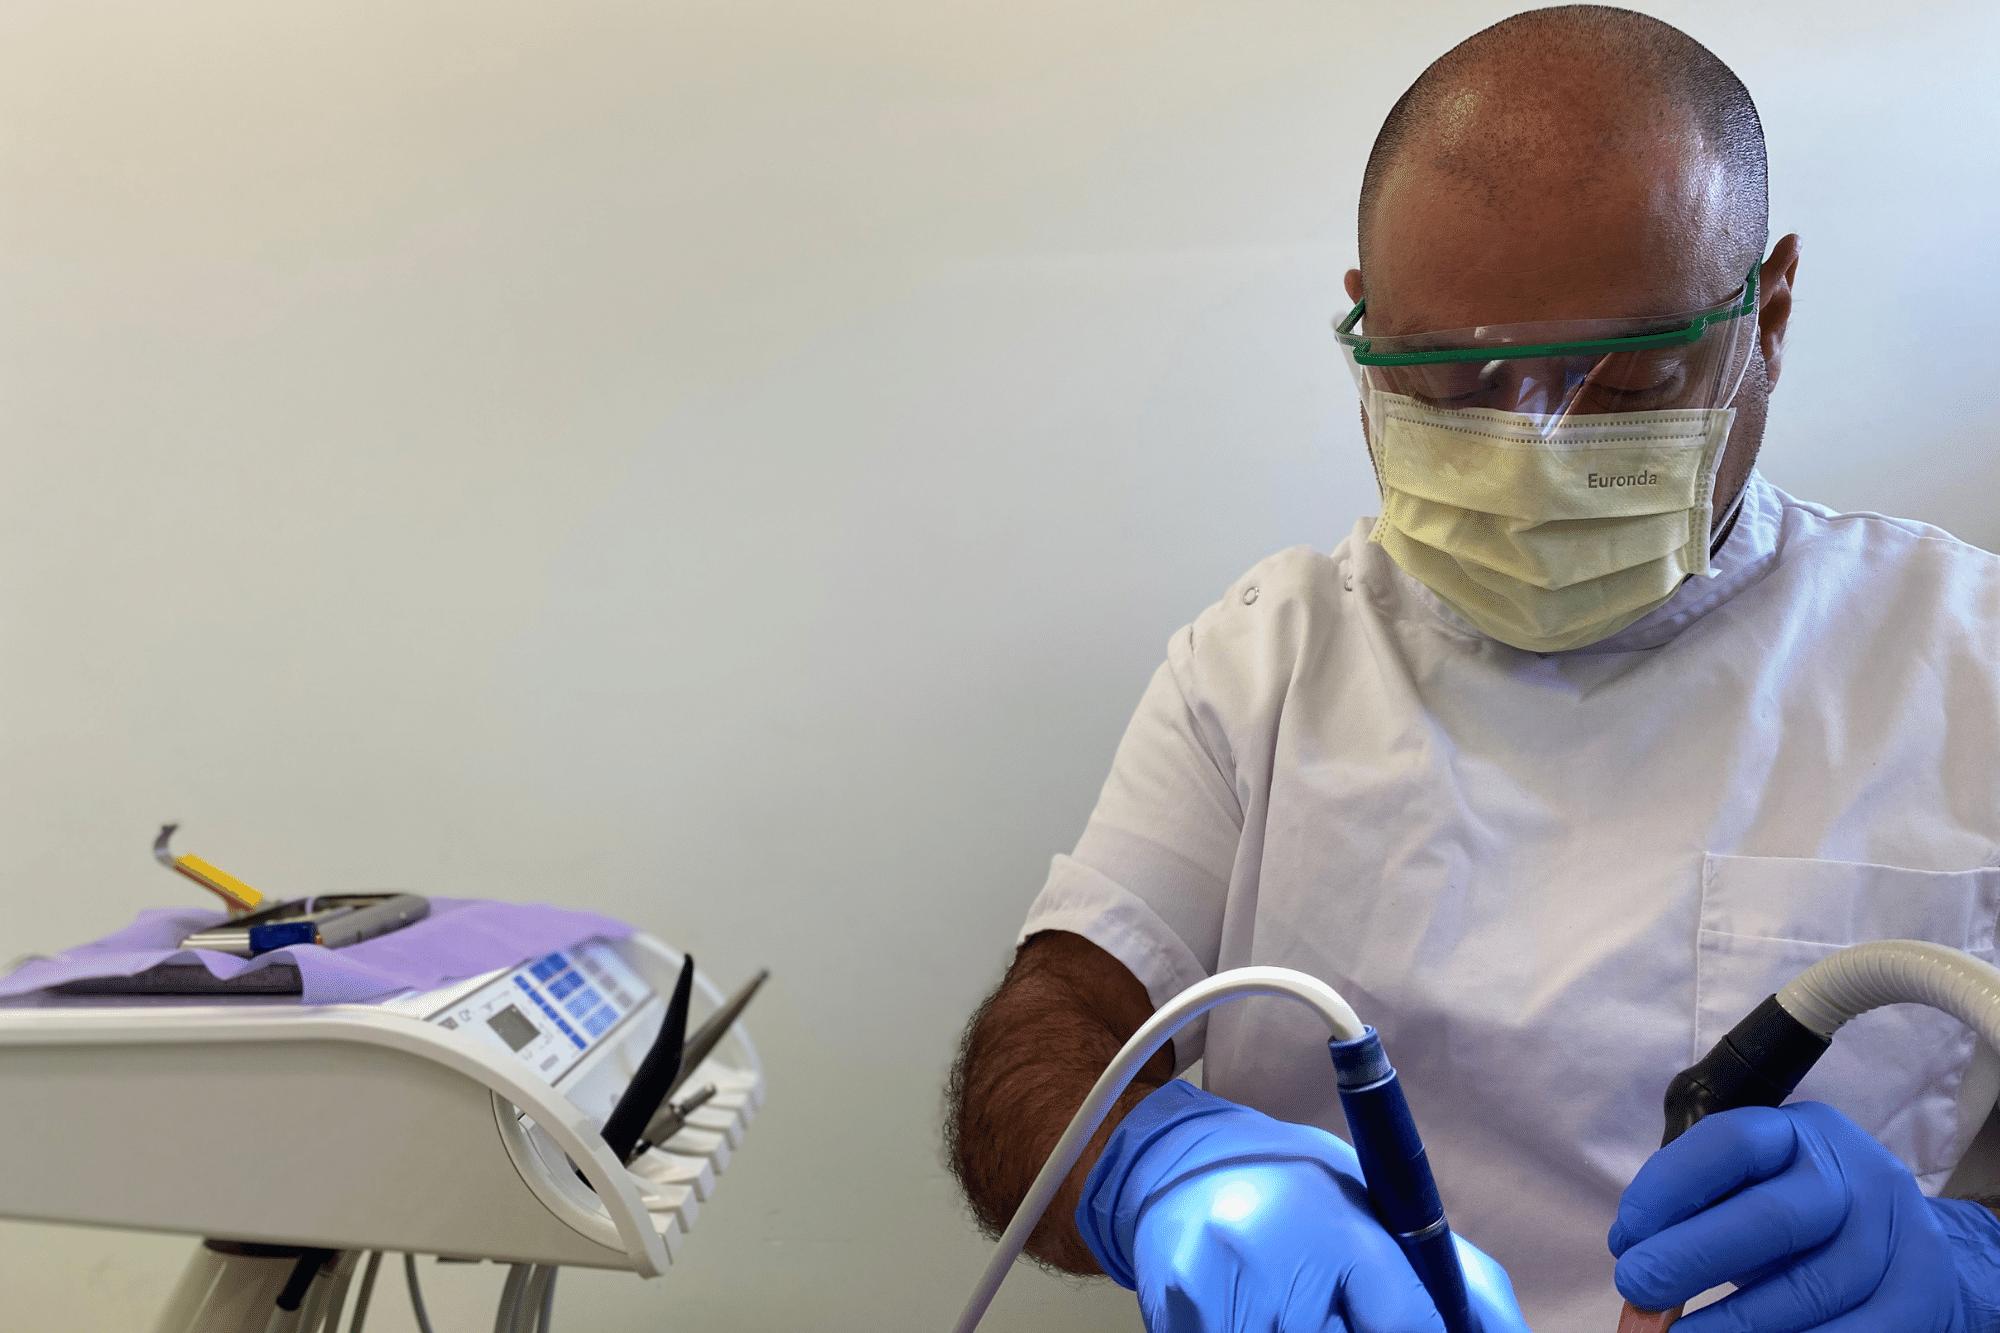 Dhr. H. javadian mondhygienist